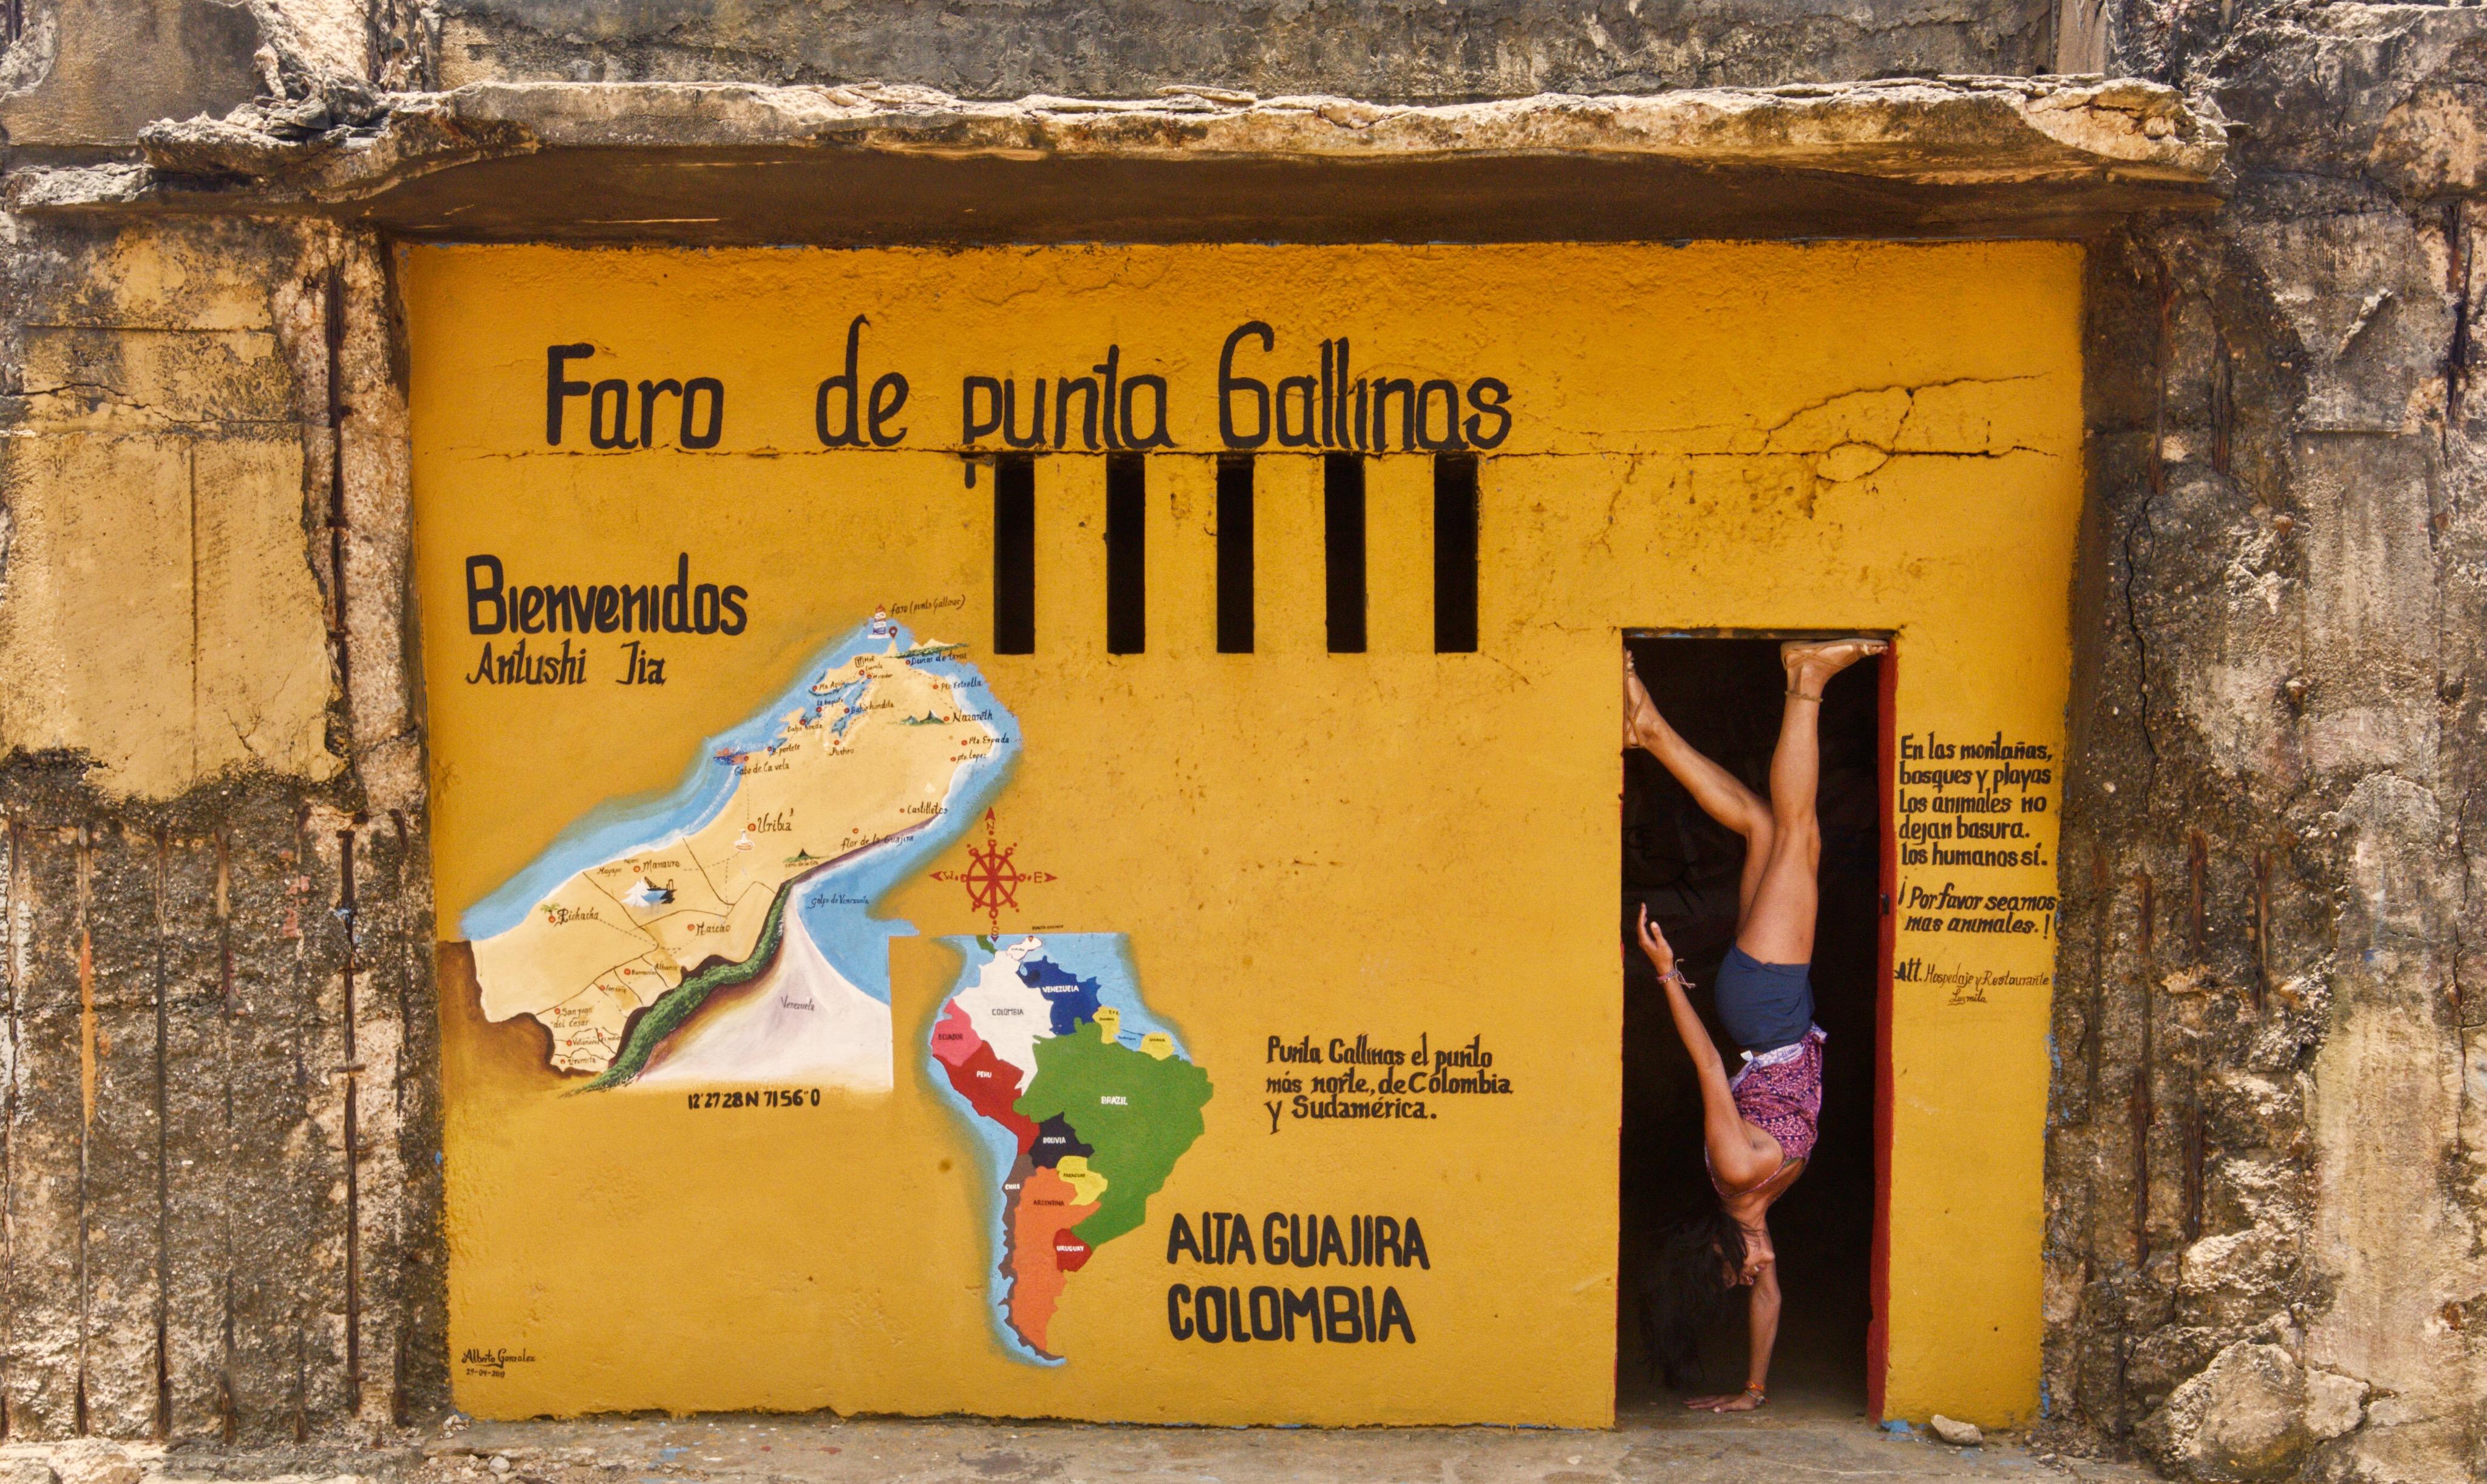 Attempted Hairstand at Punta Gallinas